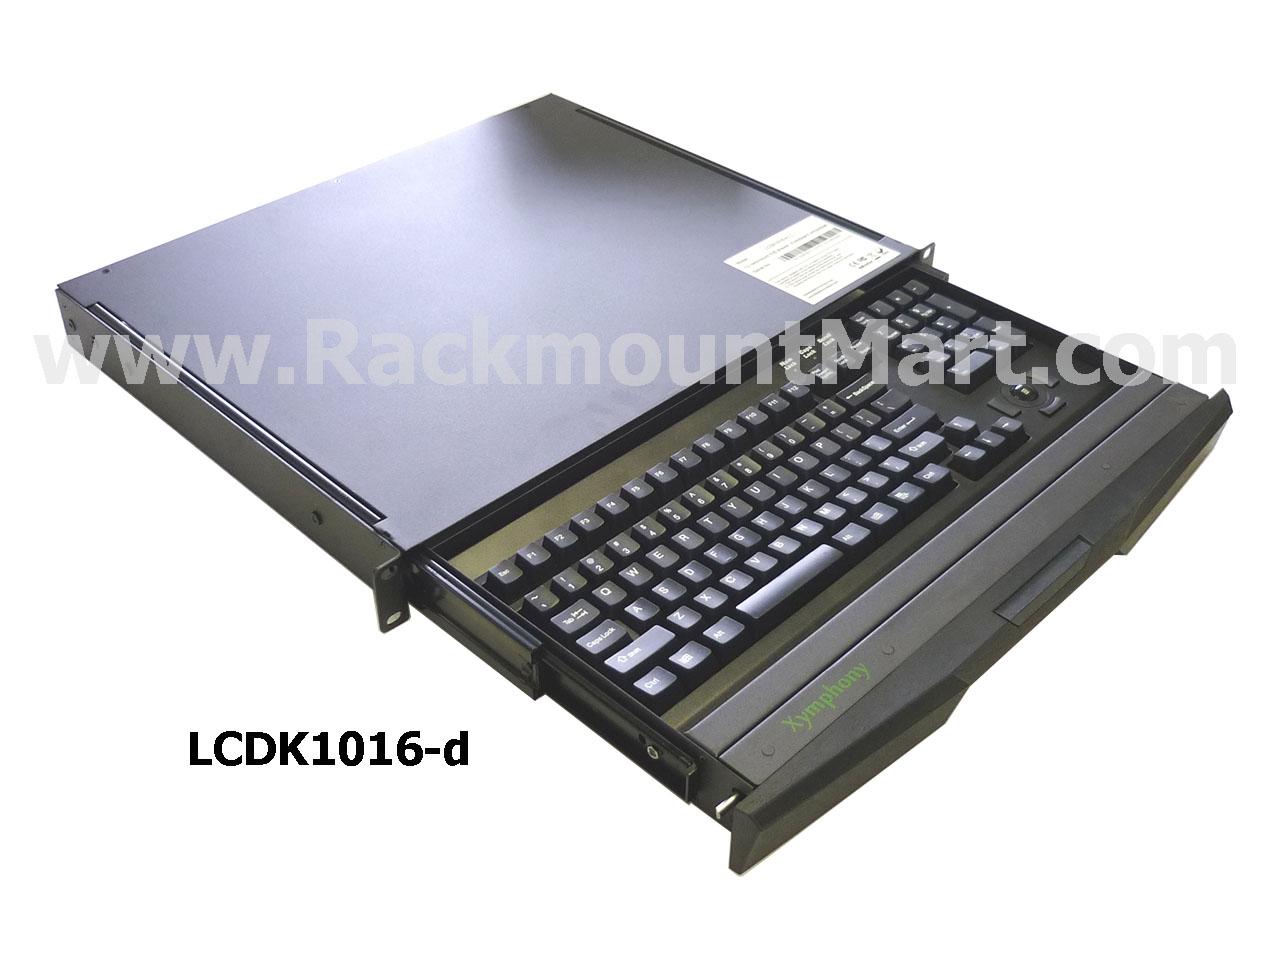 Lcdk1016 Rack Mount Keyboard Drawer Xymphony Rackmount